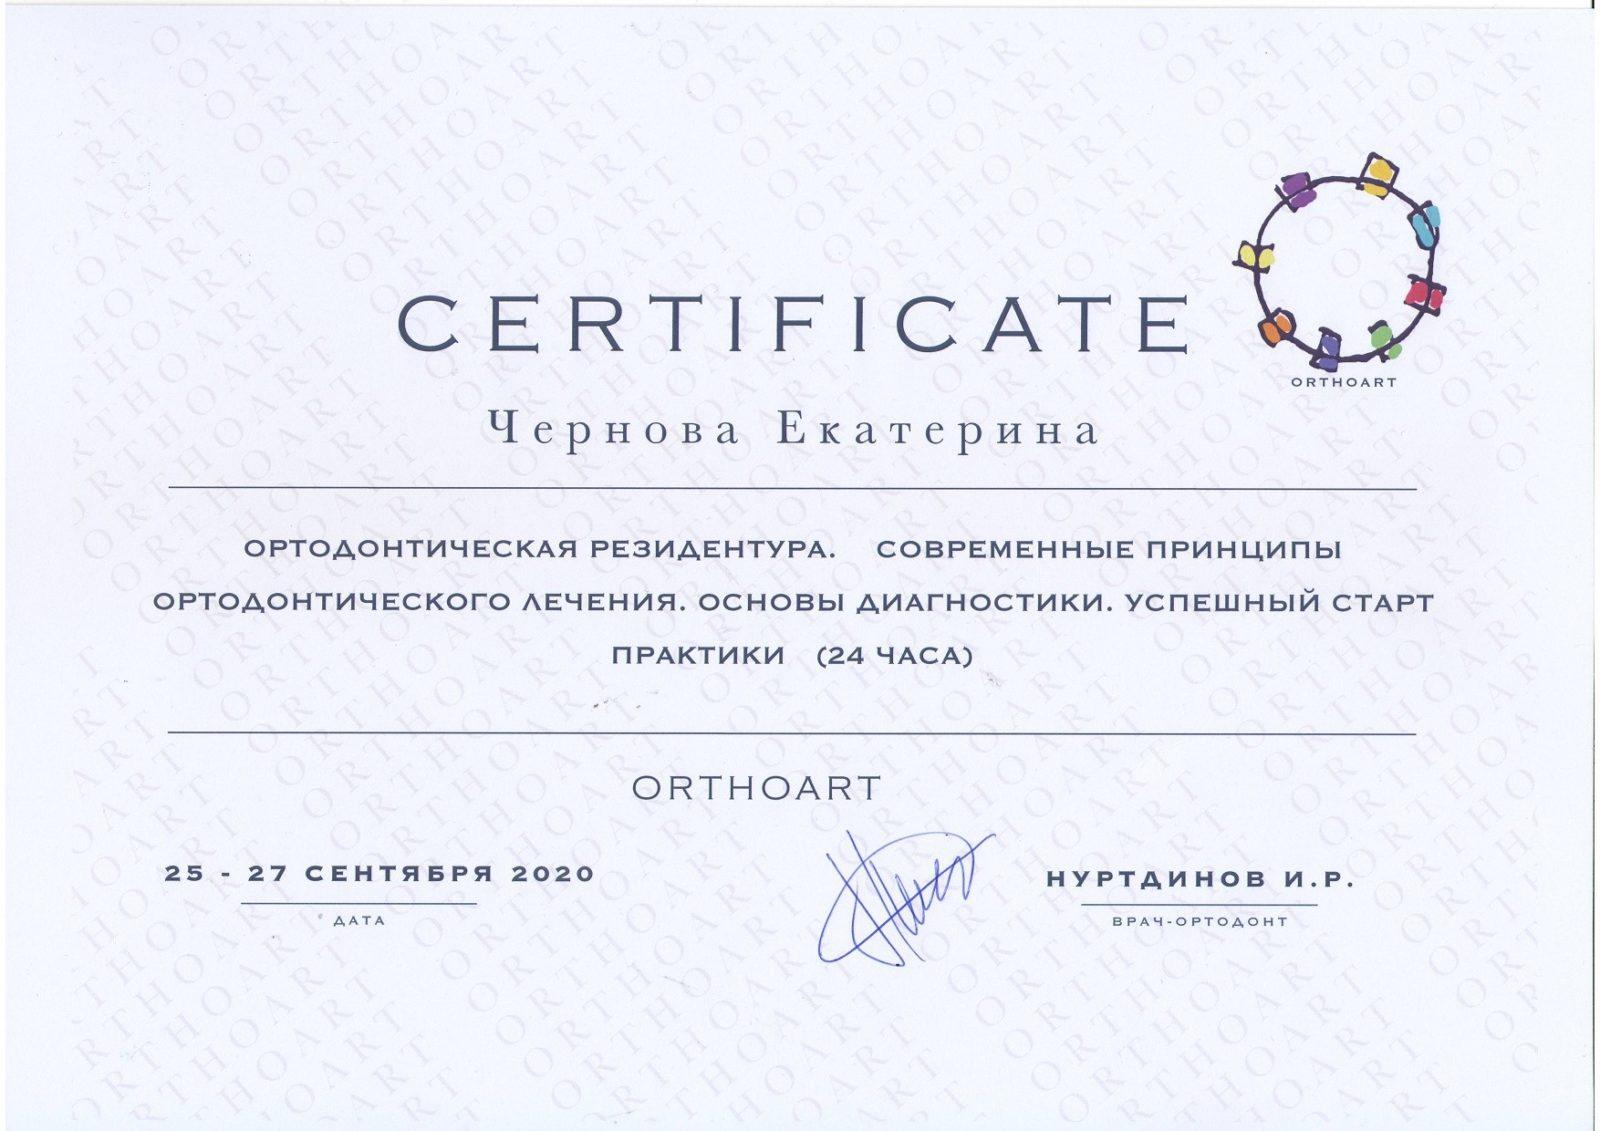 http://oris-vidnoe.ru/wp-content/uploads/2021/06/chernova-2.jpg